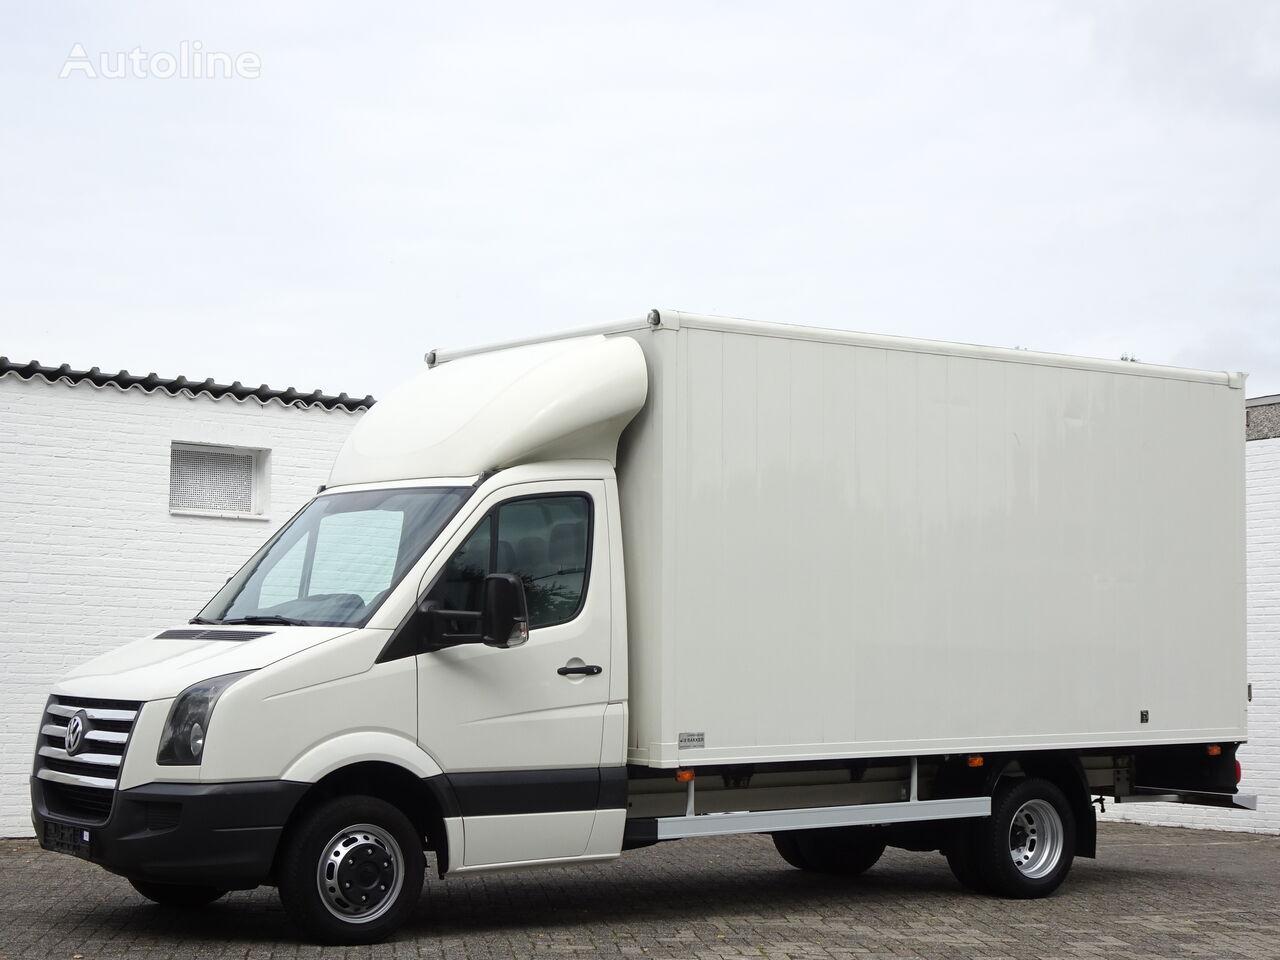 VOLKSWAGEN Crafter 2.5 Tdi 100 kw Koffer Maxi 450L Klima Lkw 3,5t Euro 4 camión furgón < 3.5t